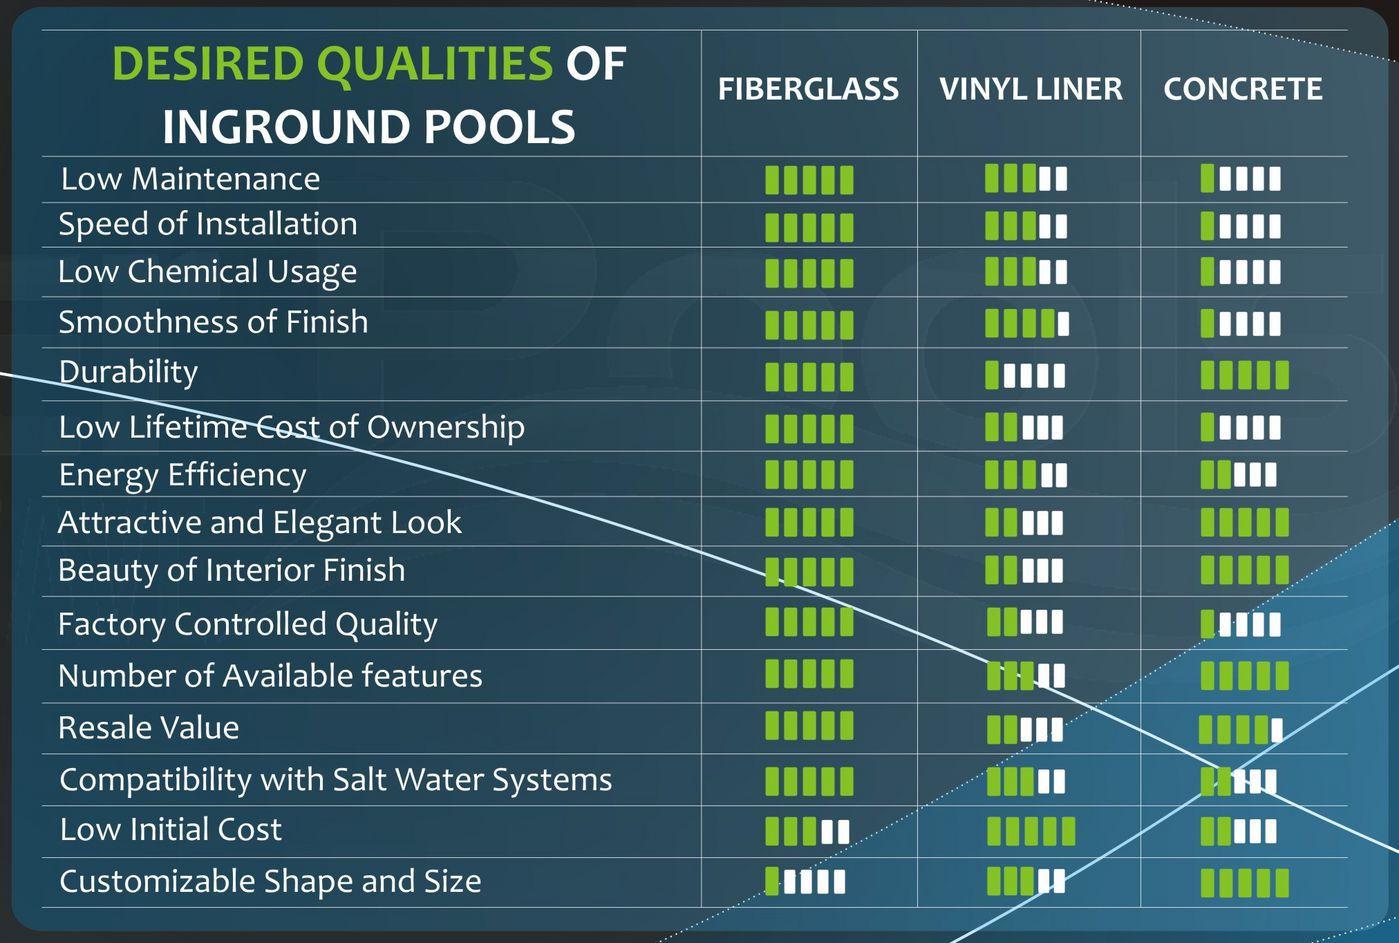 fiberglass vs concrete vs vinyl liner pool comparison chart